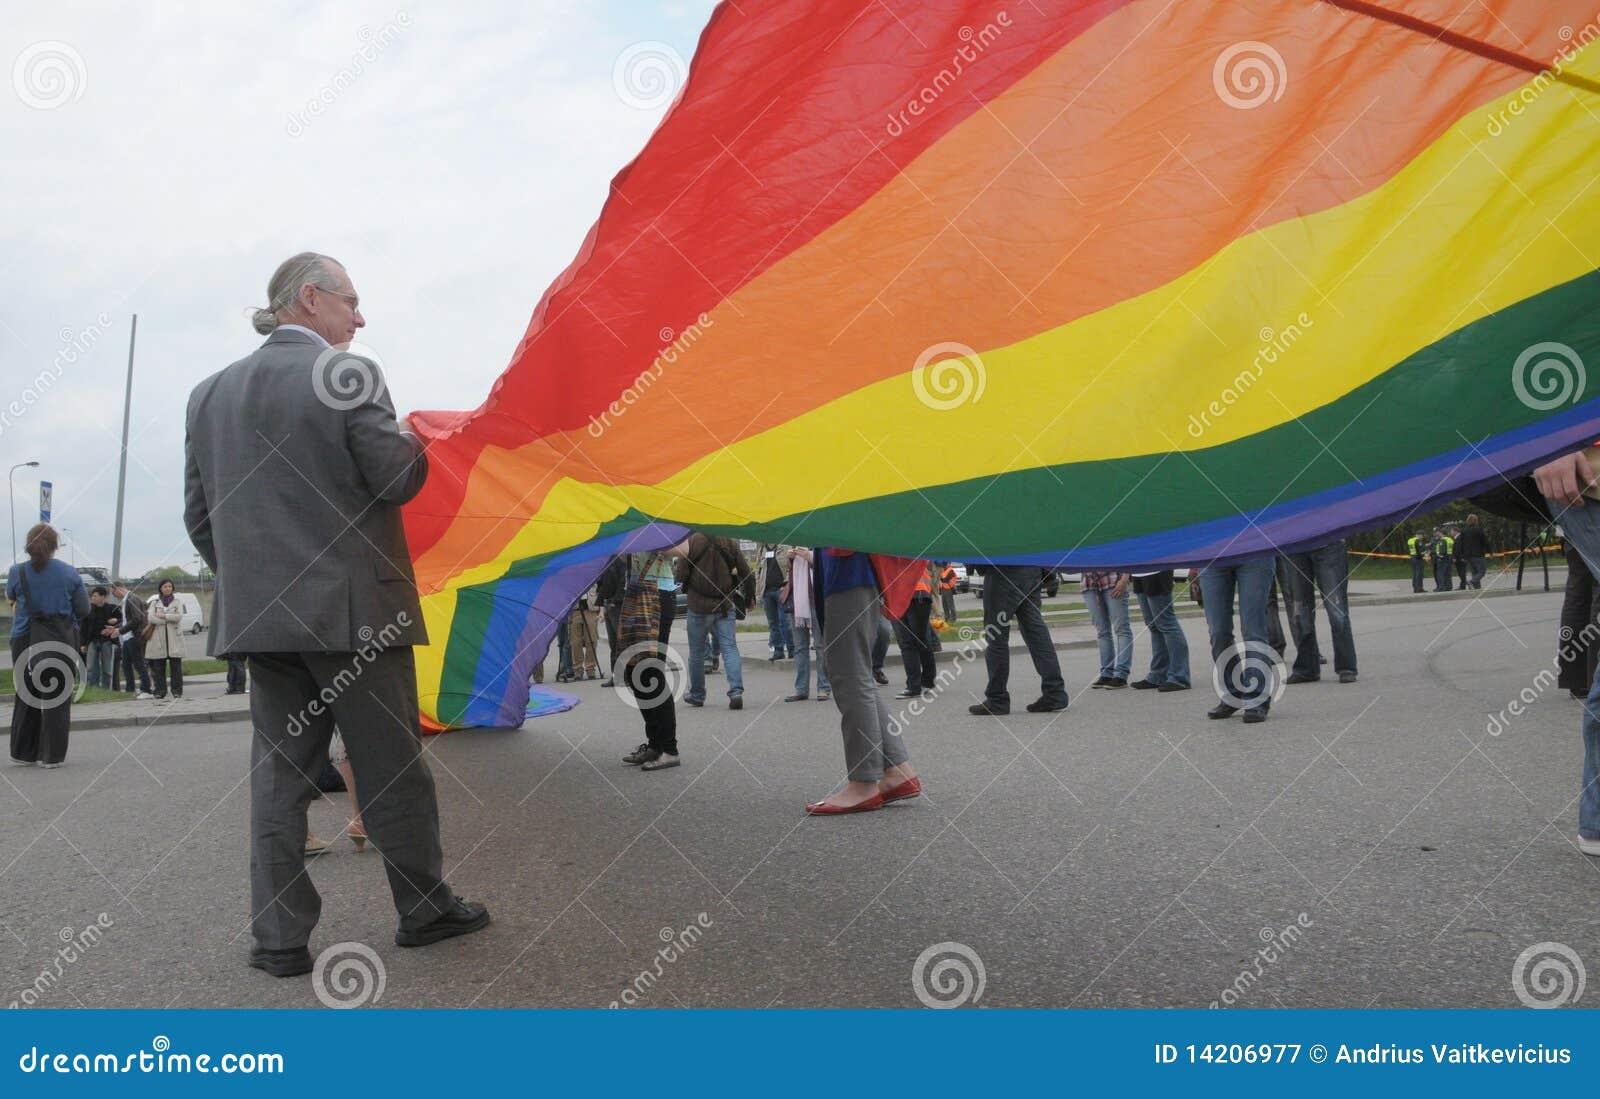 ben gay overdose death